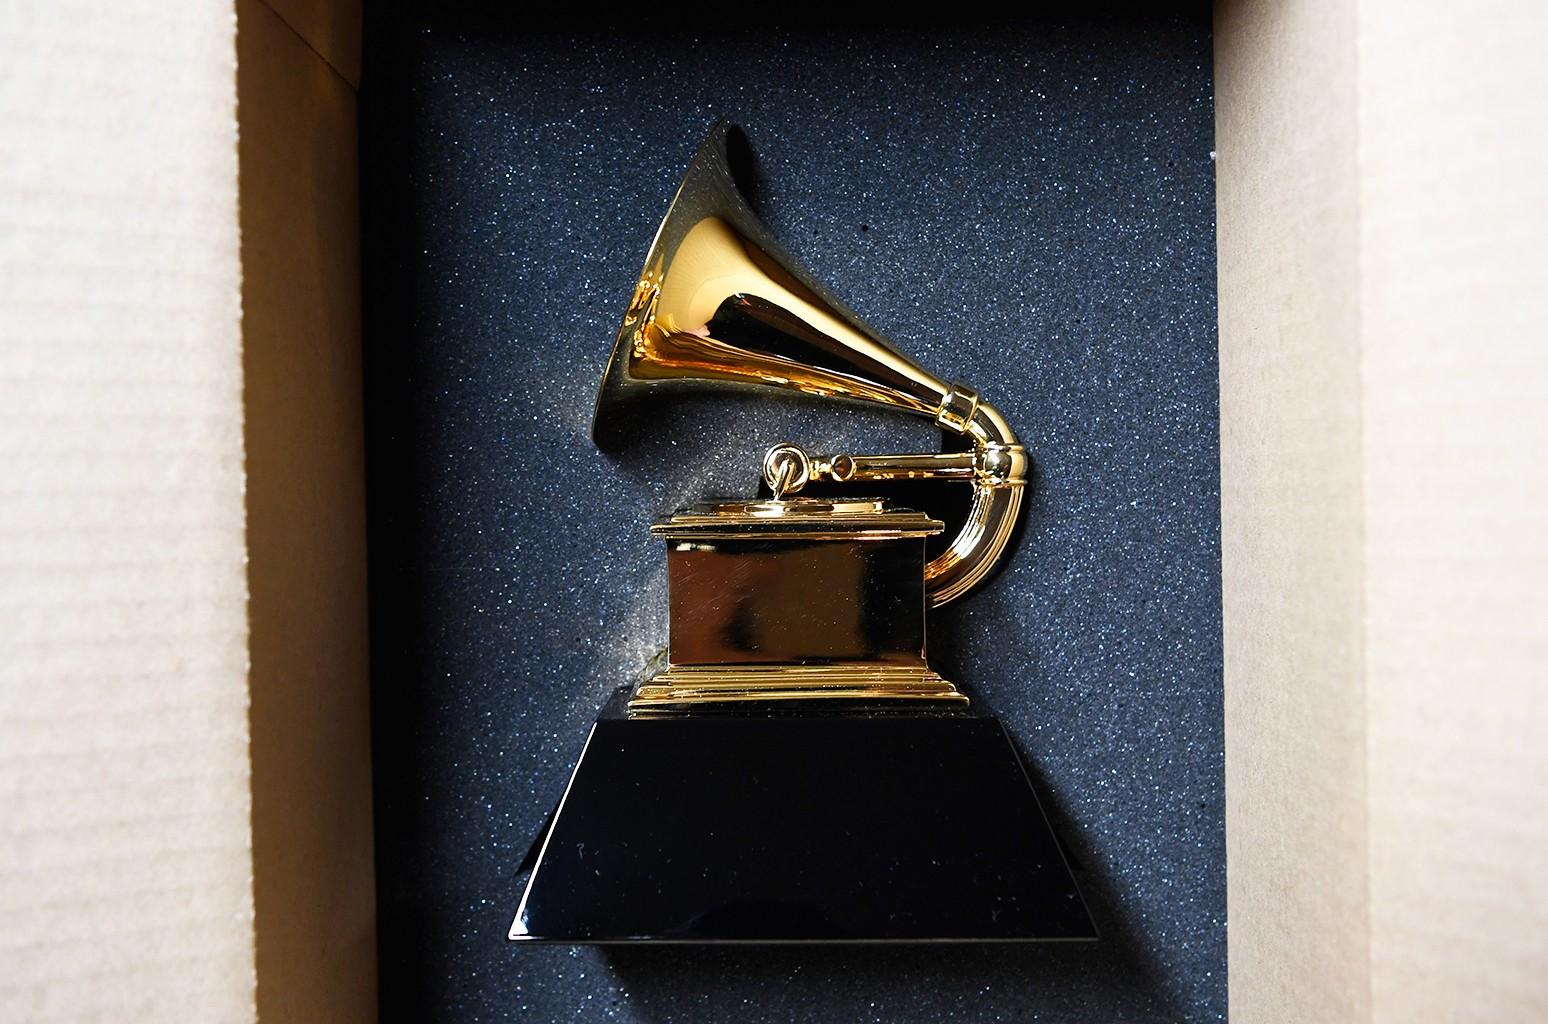 Grammy trophy